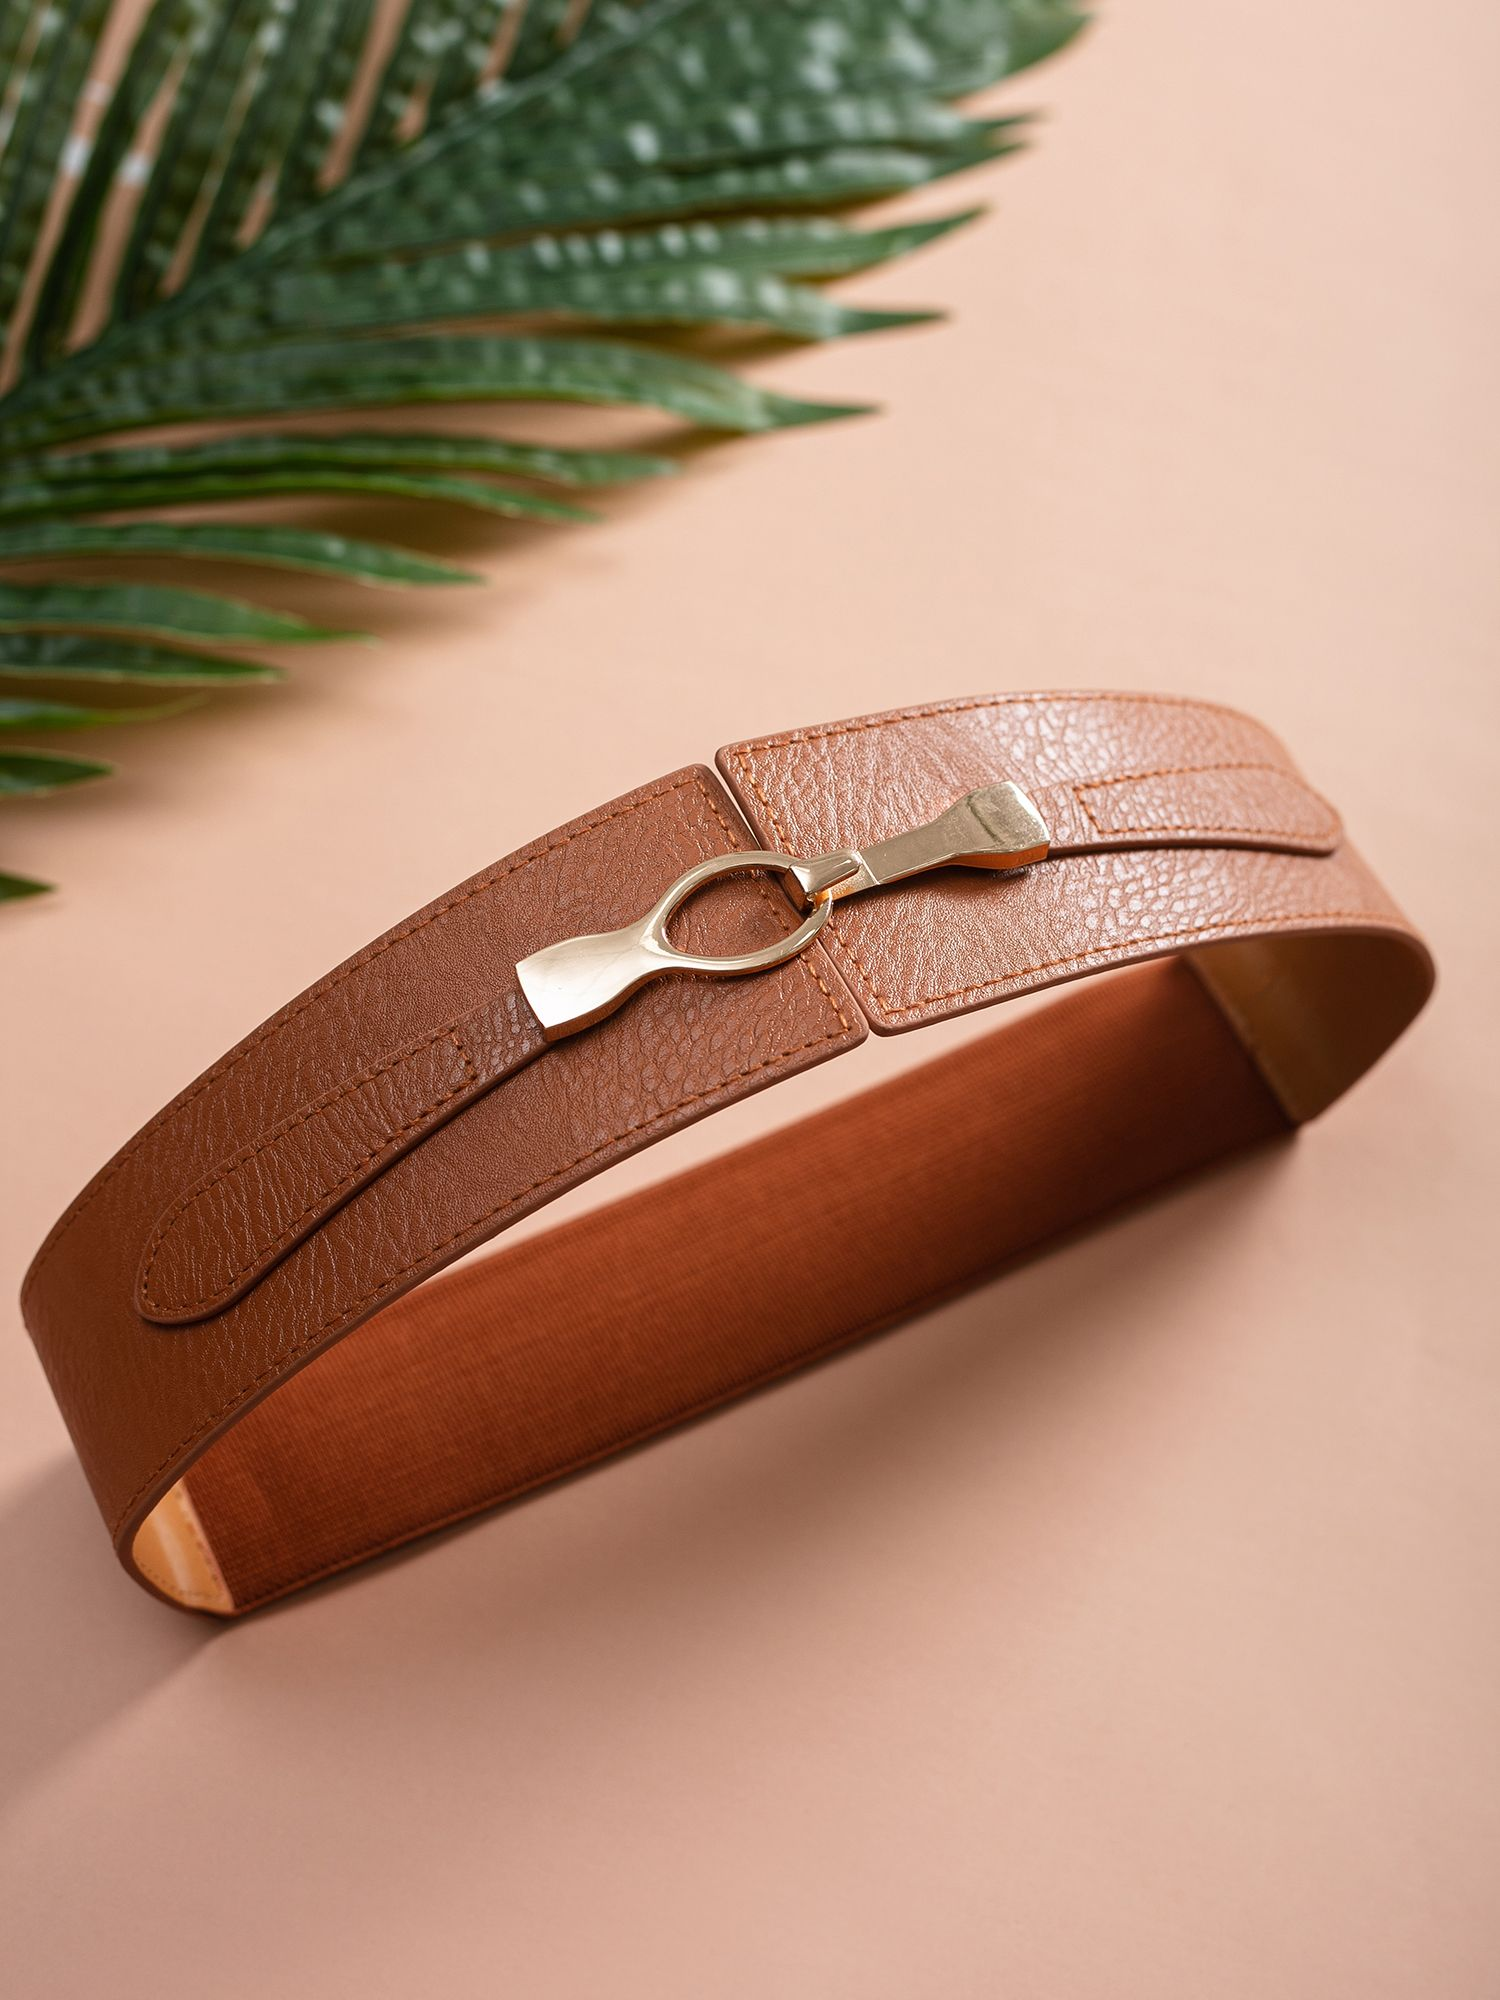 Belts-Brown Always In Fashion Belt1